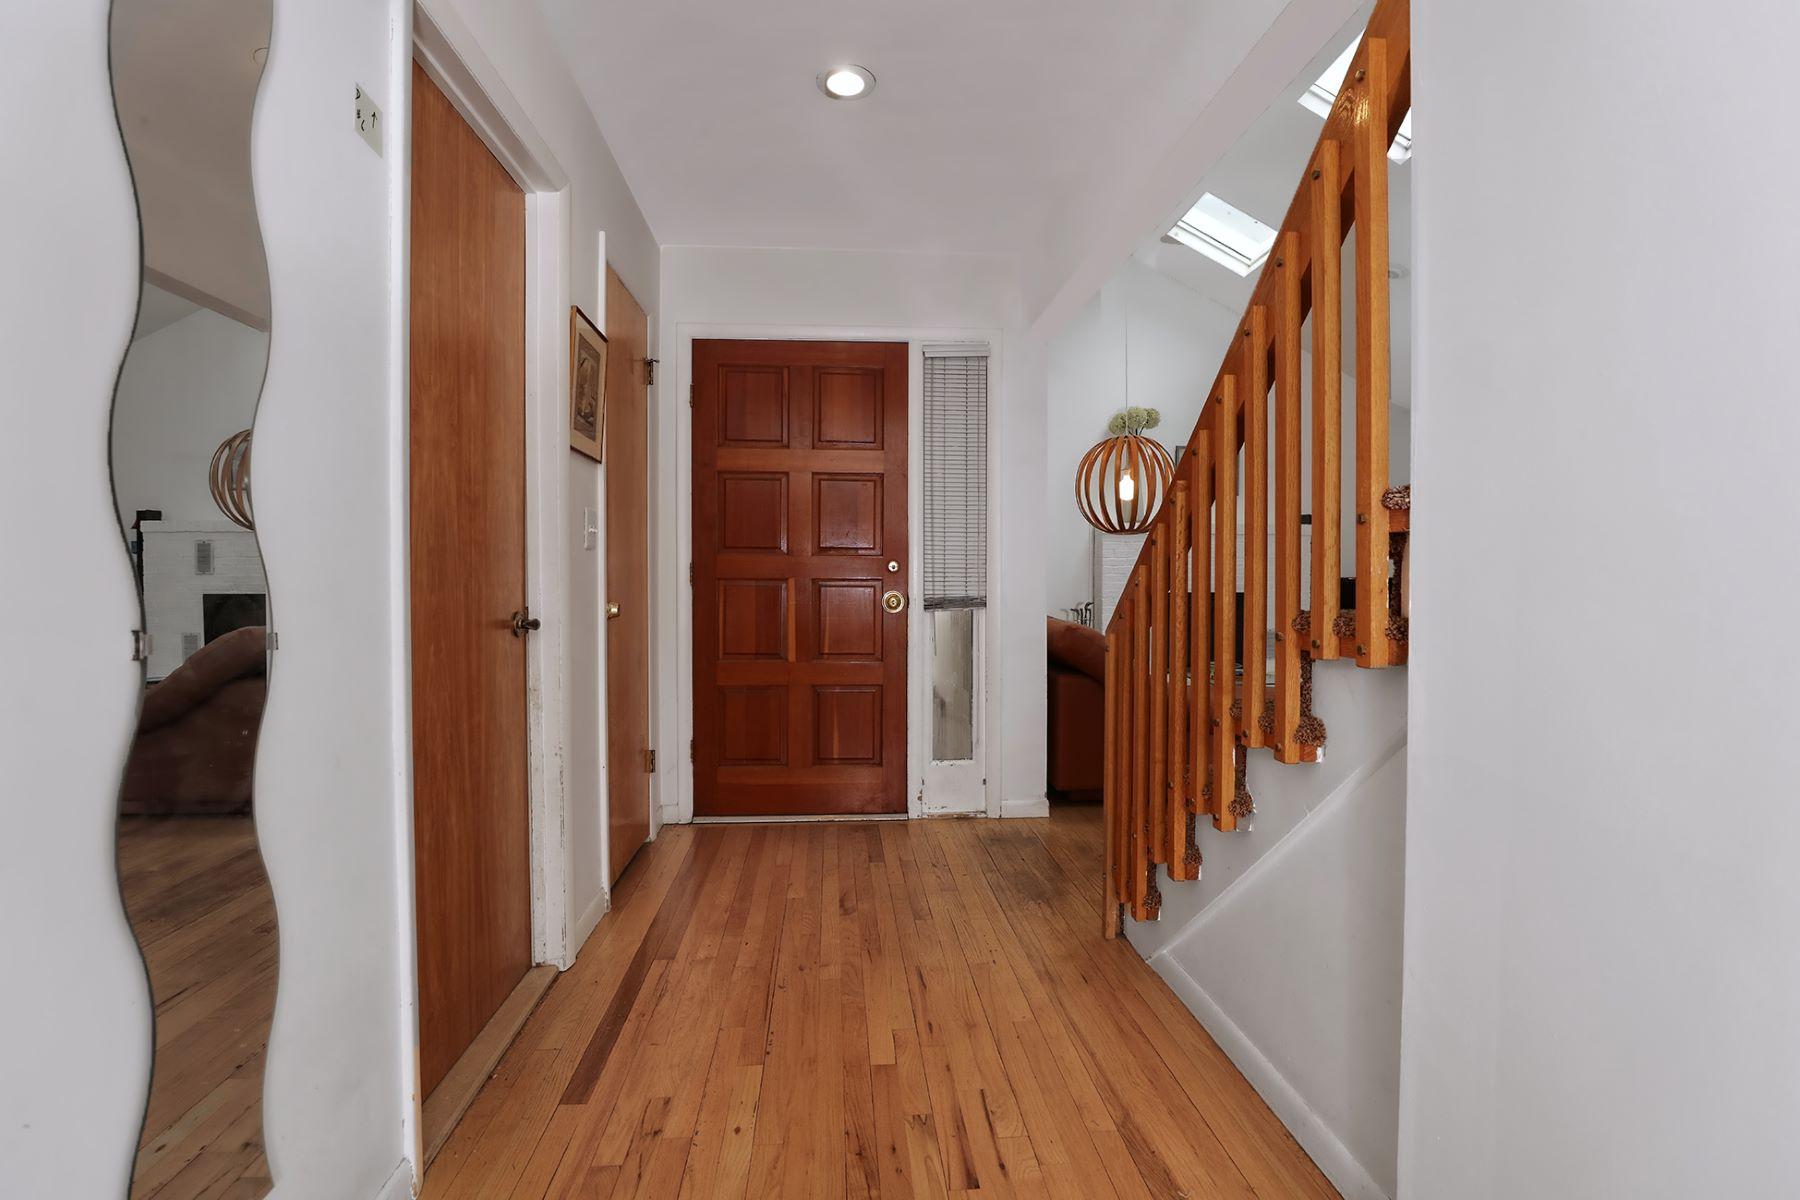 Additional photo for property listing at Flowering Trees Surround Modern Lawrenceville Home 43 Laurel Wood Drive, Lawrenceville, 新澤西州 08648 美國